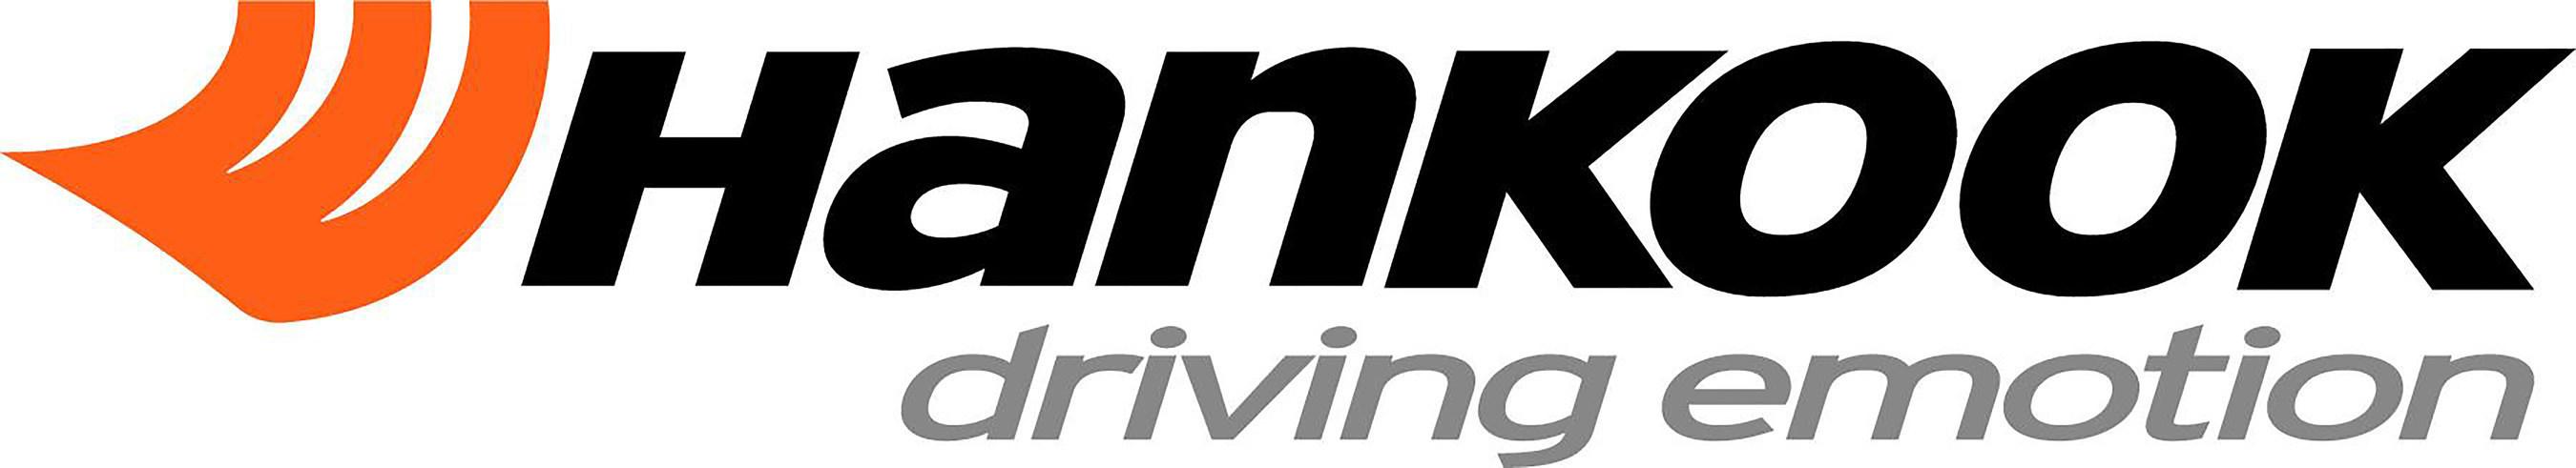 Hankook Tire Emotion Logo